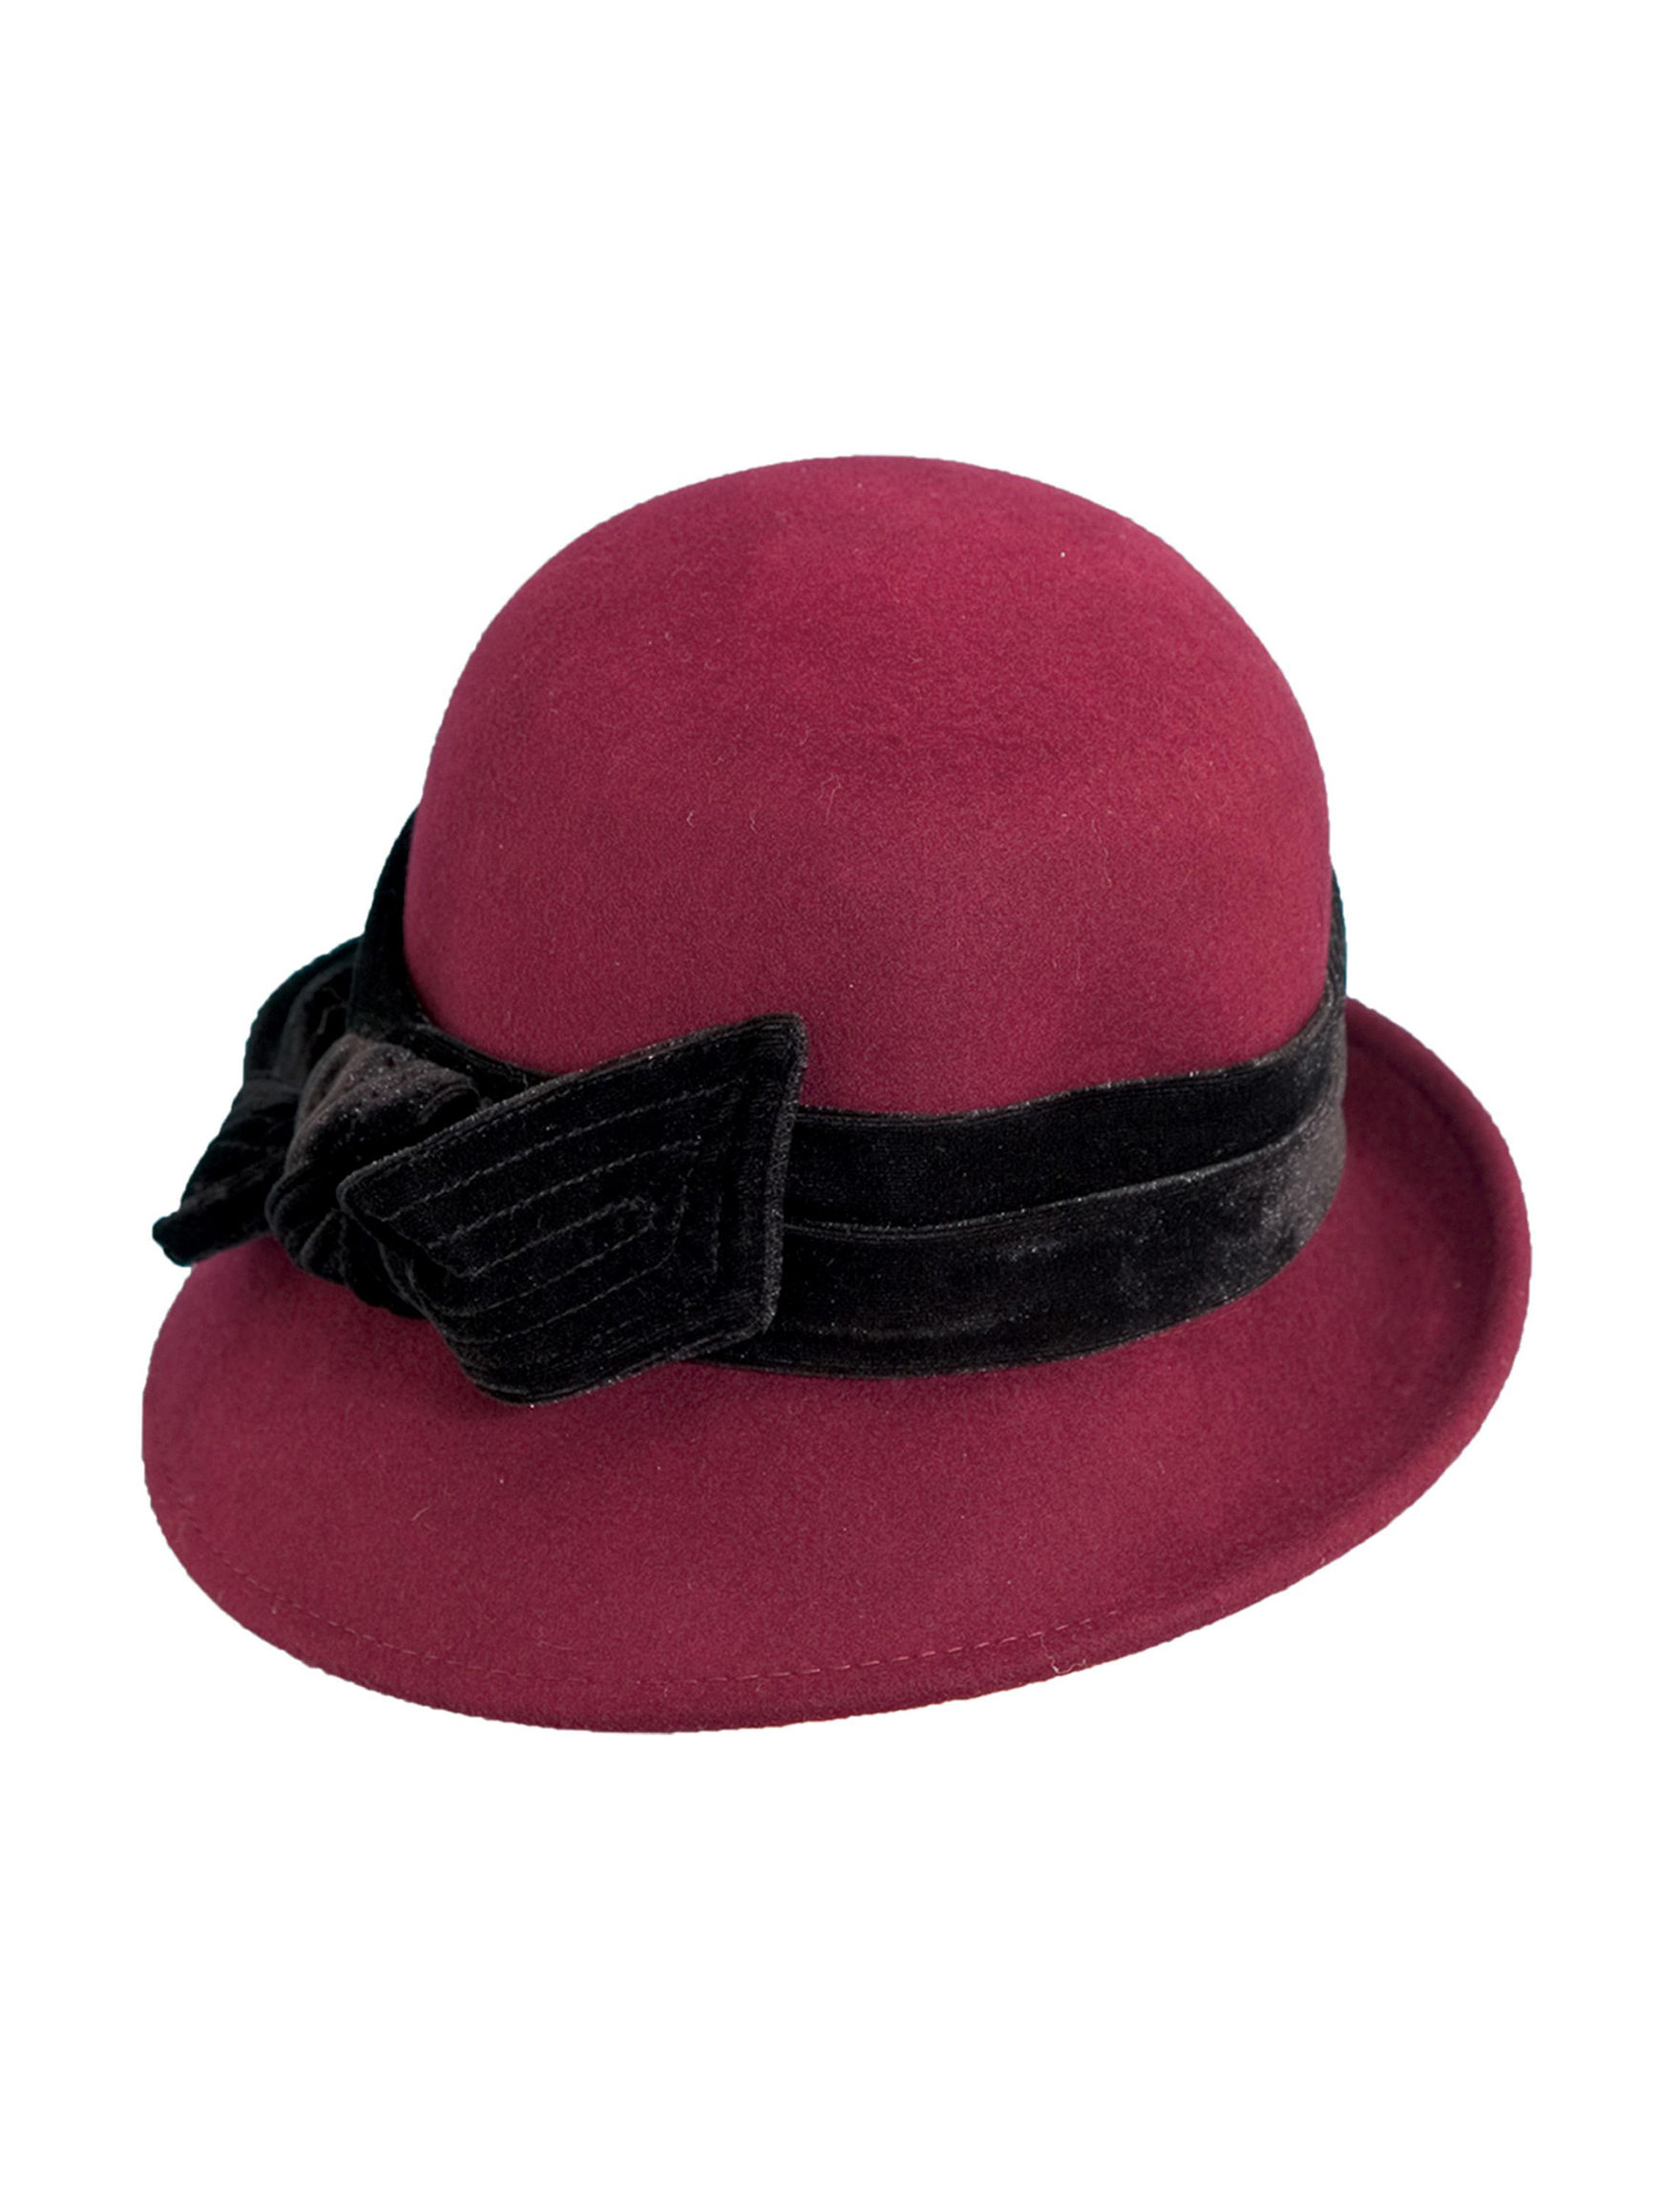 Scala Wool Felt Cloche Hat  c0017316ec73